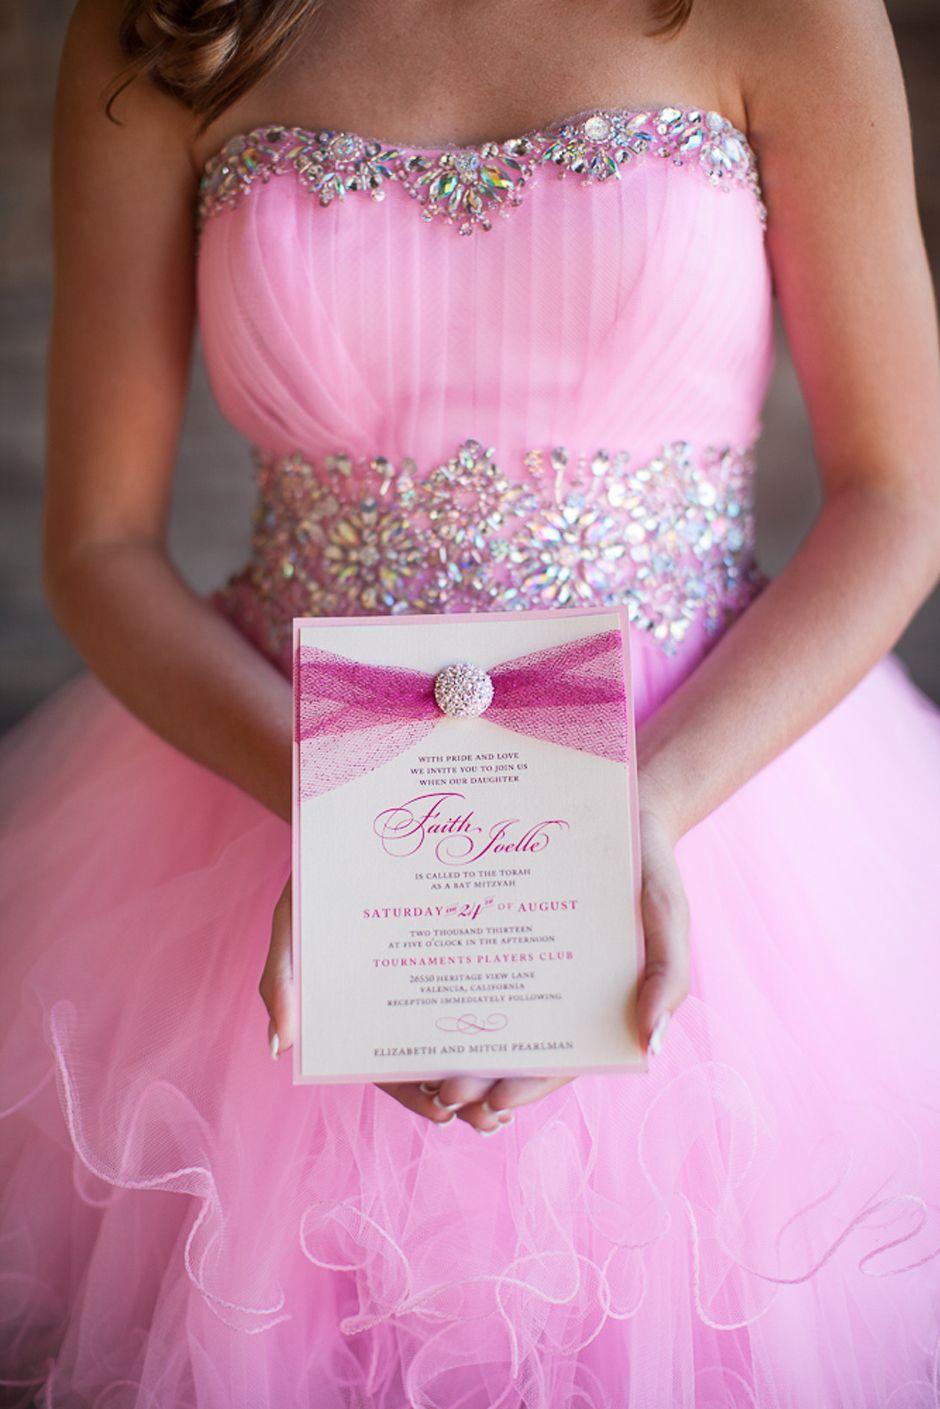 Glamorous Pink Princess Bat Mitzvah | http://www.beccarillo.com/bat ...